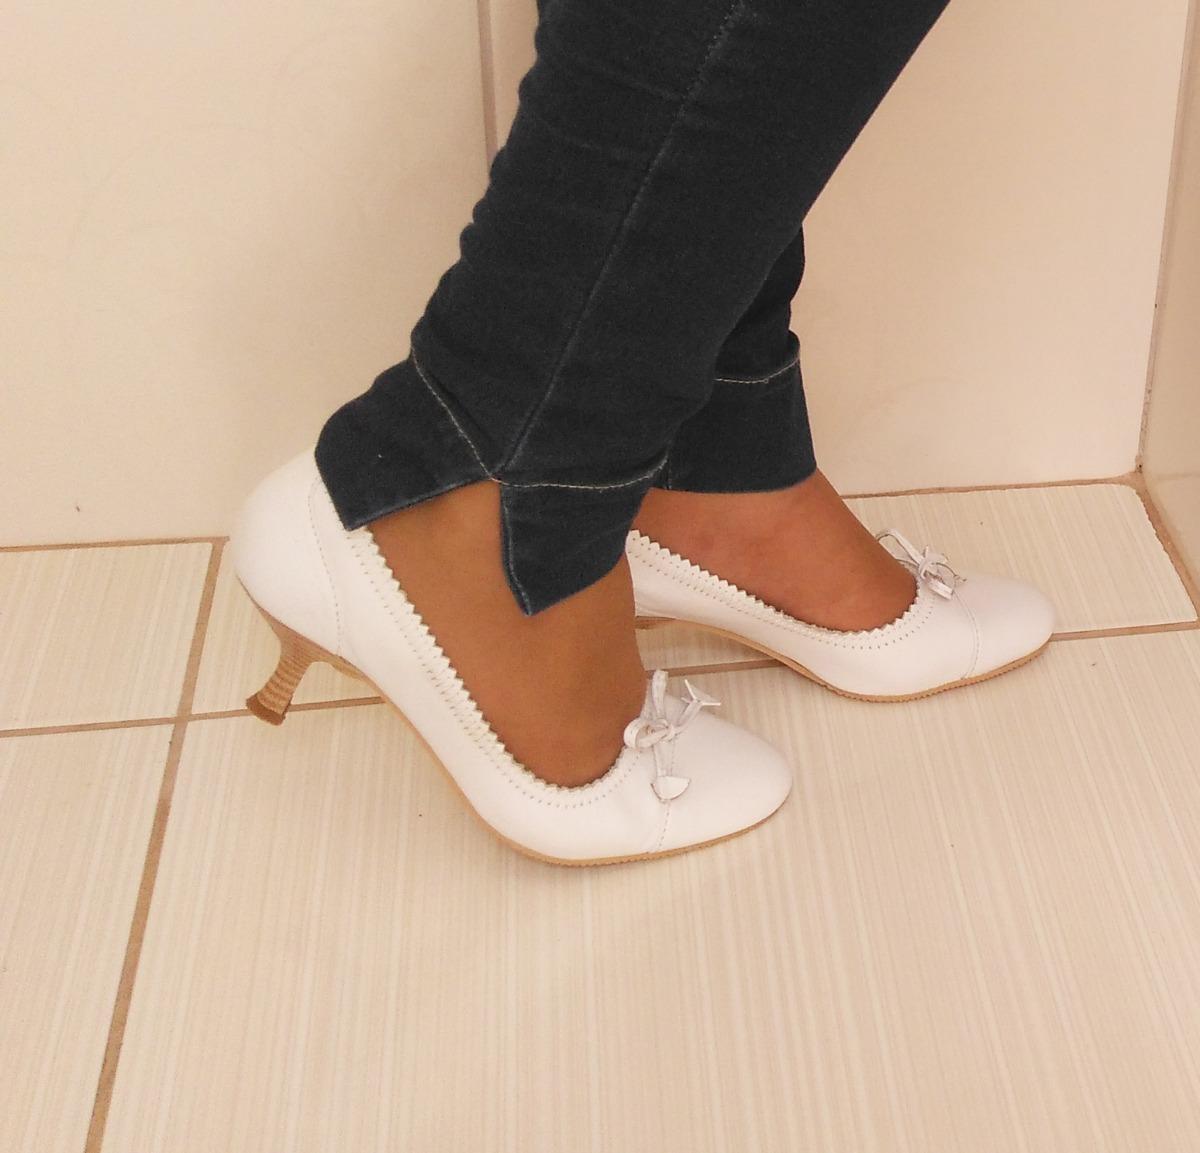 0951b5aff sapato scarpin branco salto durval calçados finos nº 37. Carregando zoom.